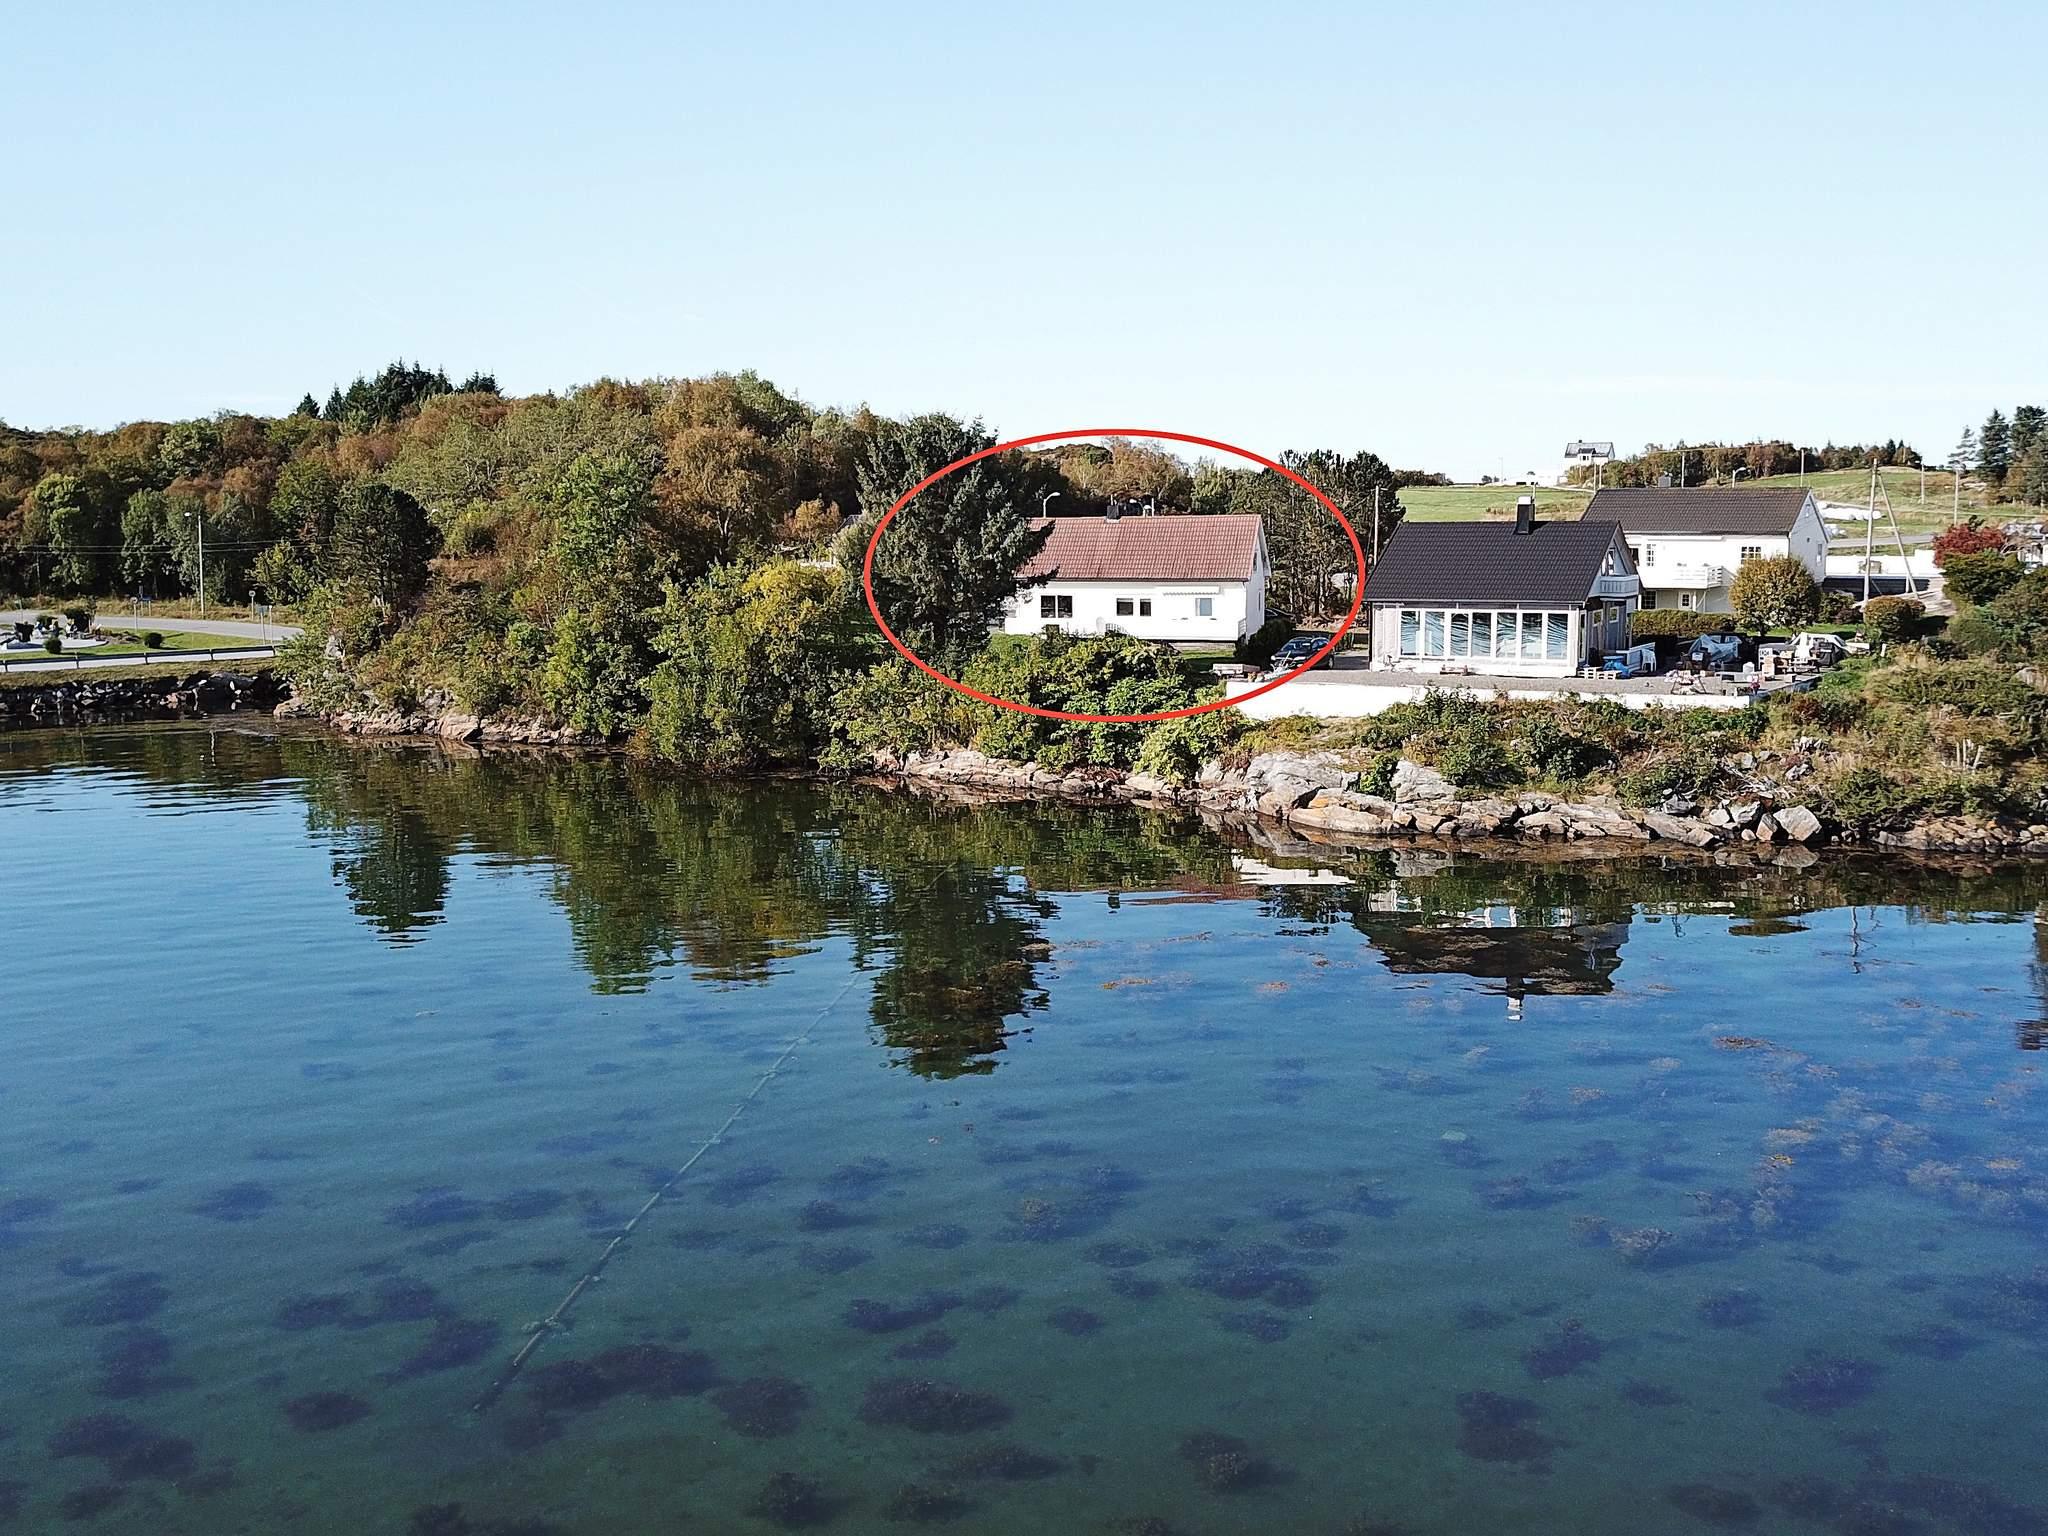 Ferienhaus Vevang (85080), Vevang, More - Romsdal, Westnorwegen, Norwegen, Bild 19